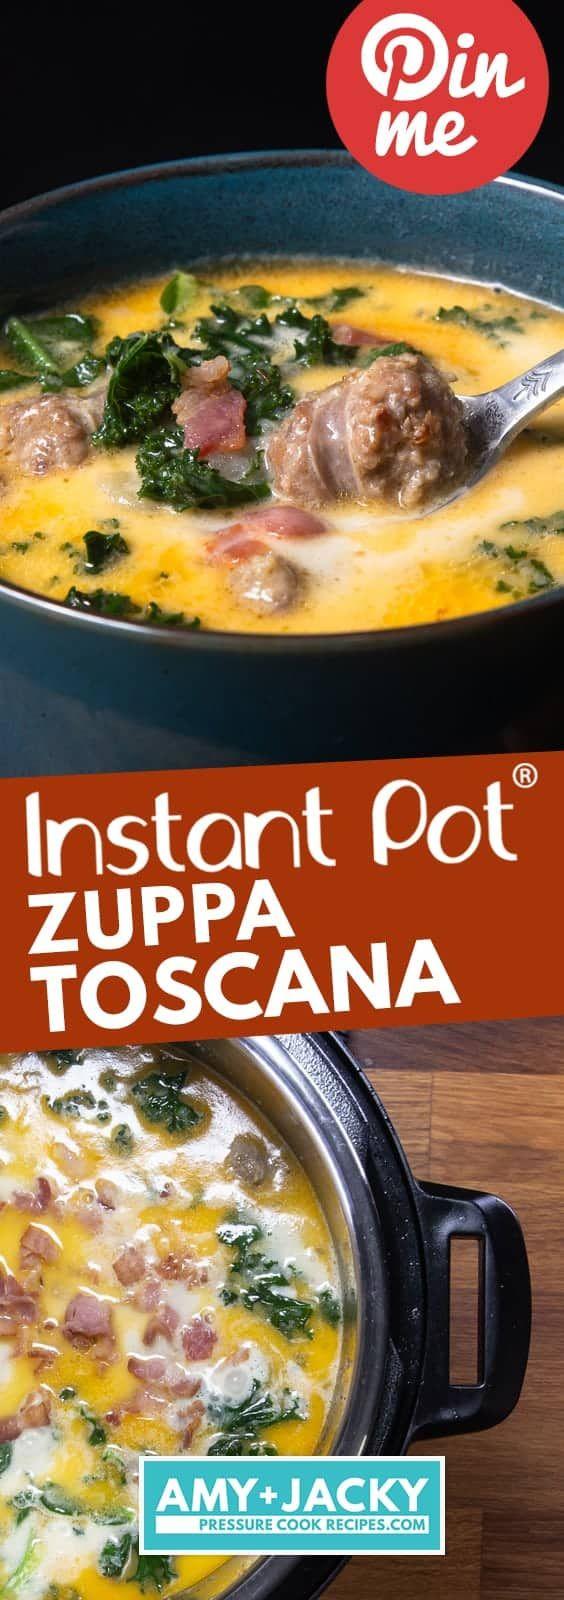 Instant Pot Zuppa Toscana #zuppatoscanasoup